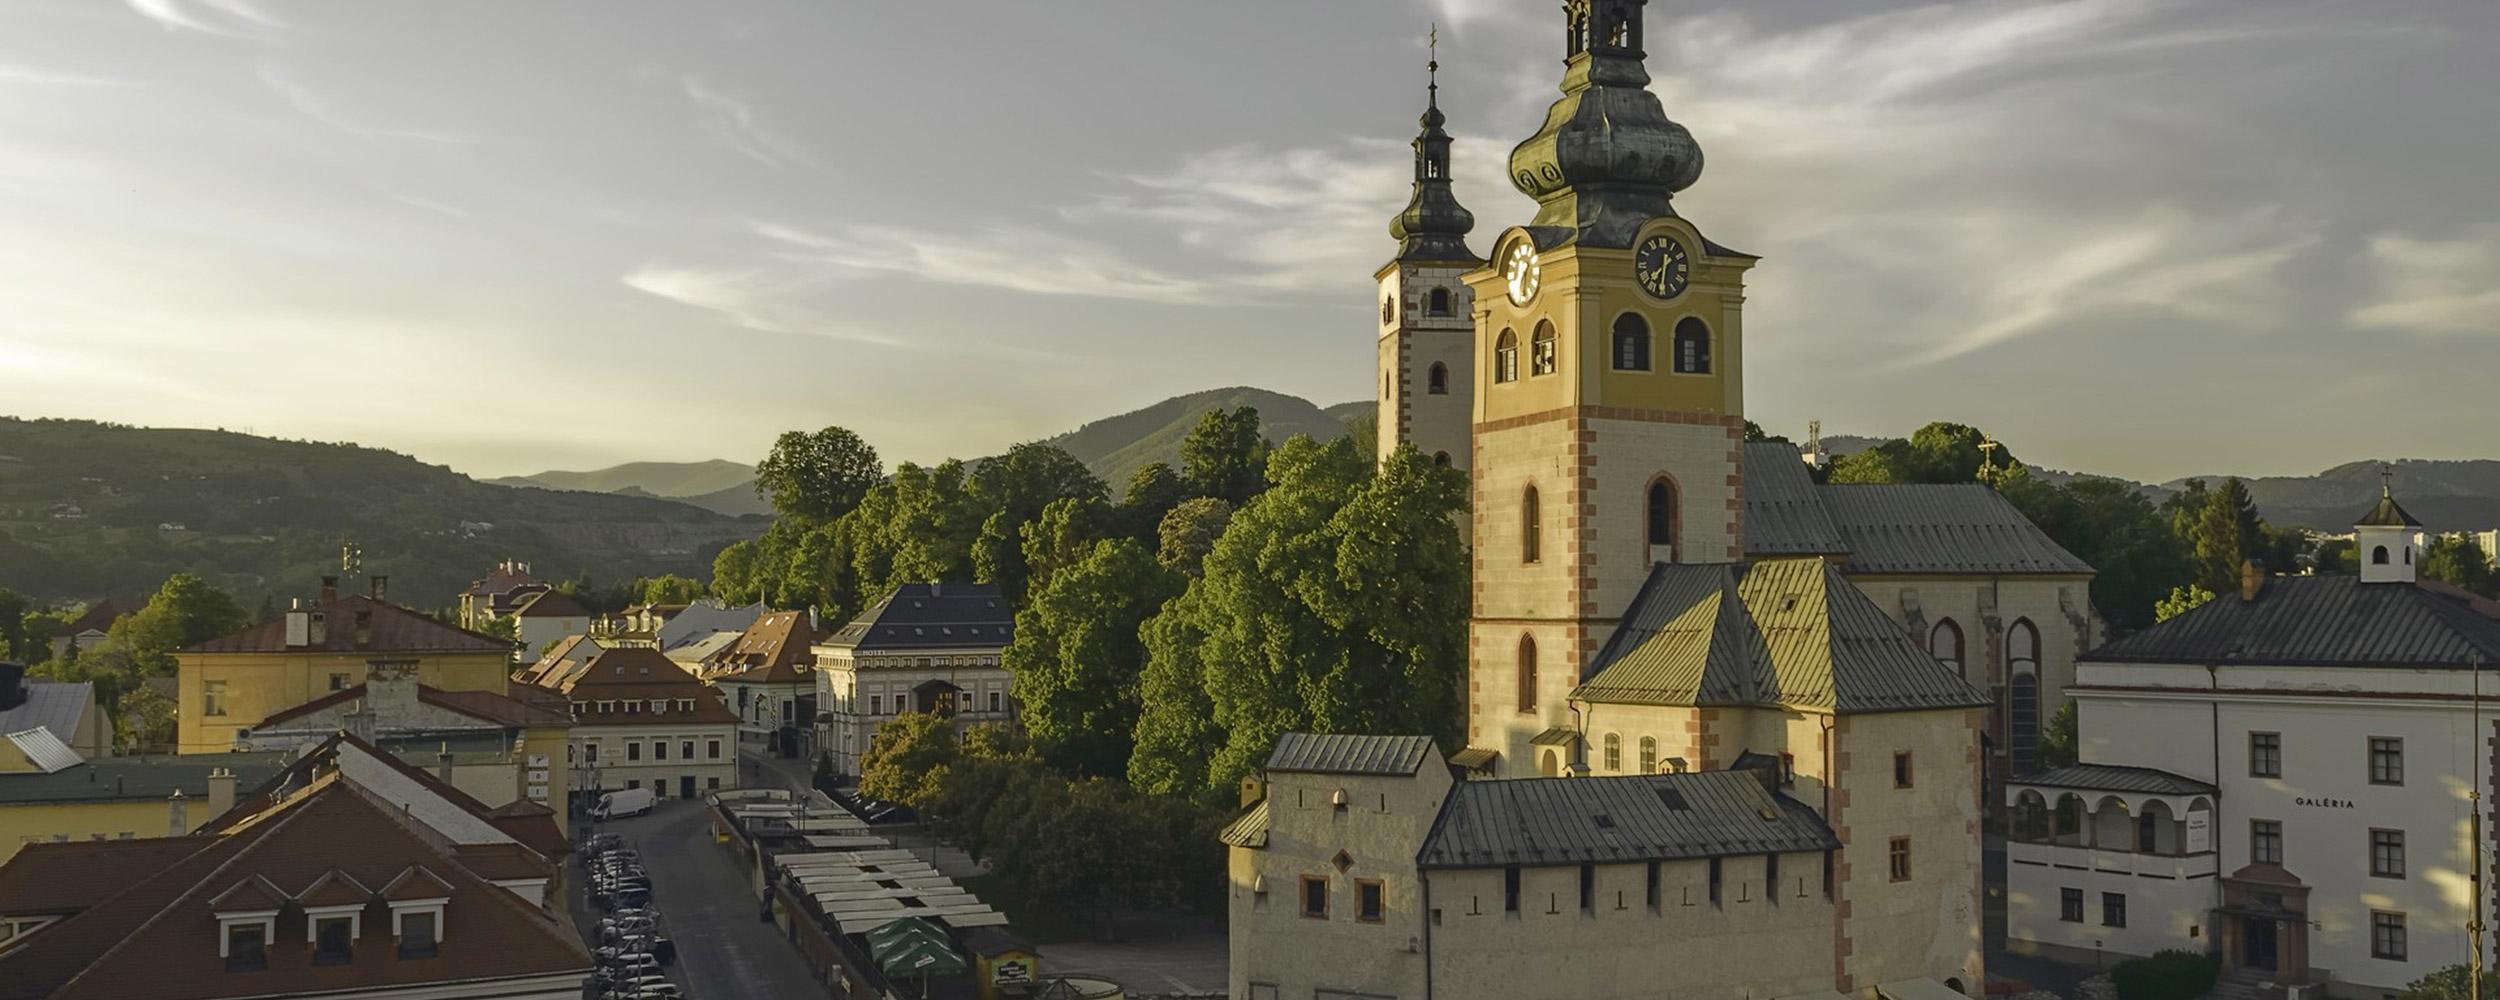 Banská Bystrica Barbakan, Slovakia